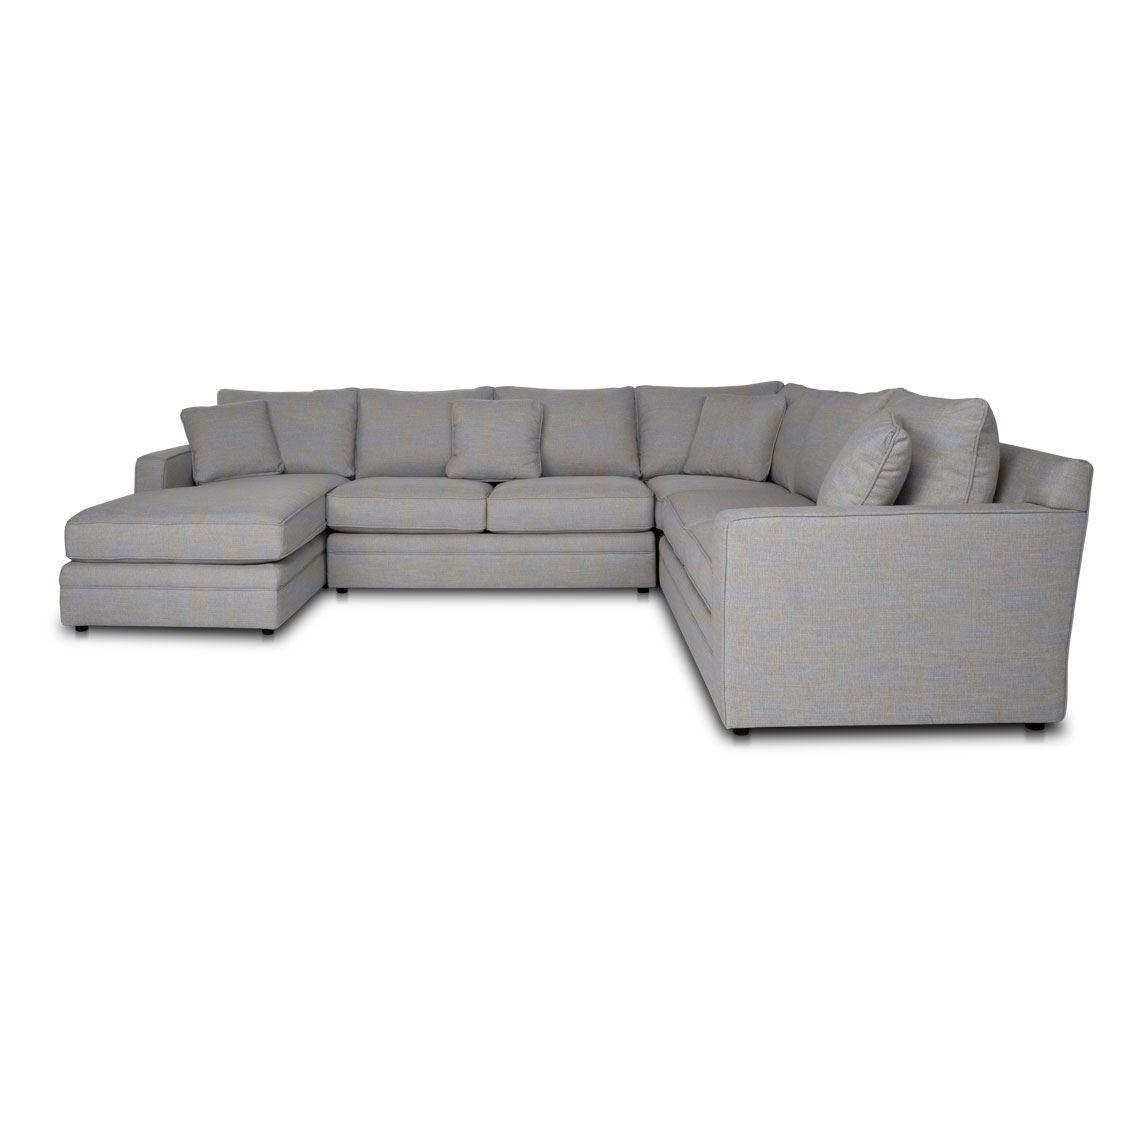 Andersen 6 Seat Fabric Corner Modular Sofa With Right Chaise Modular Sofa Fabric Sofa White Dining Room Chairs